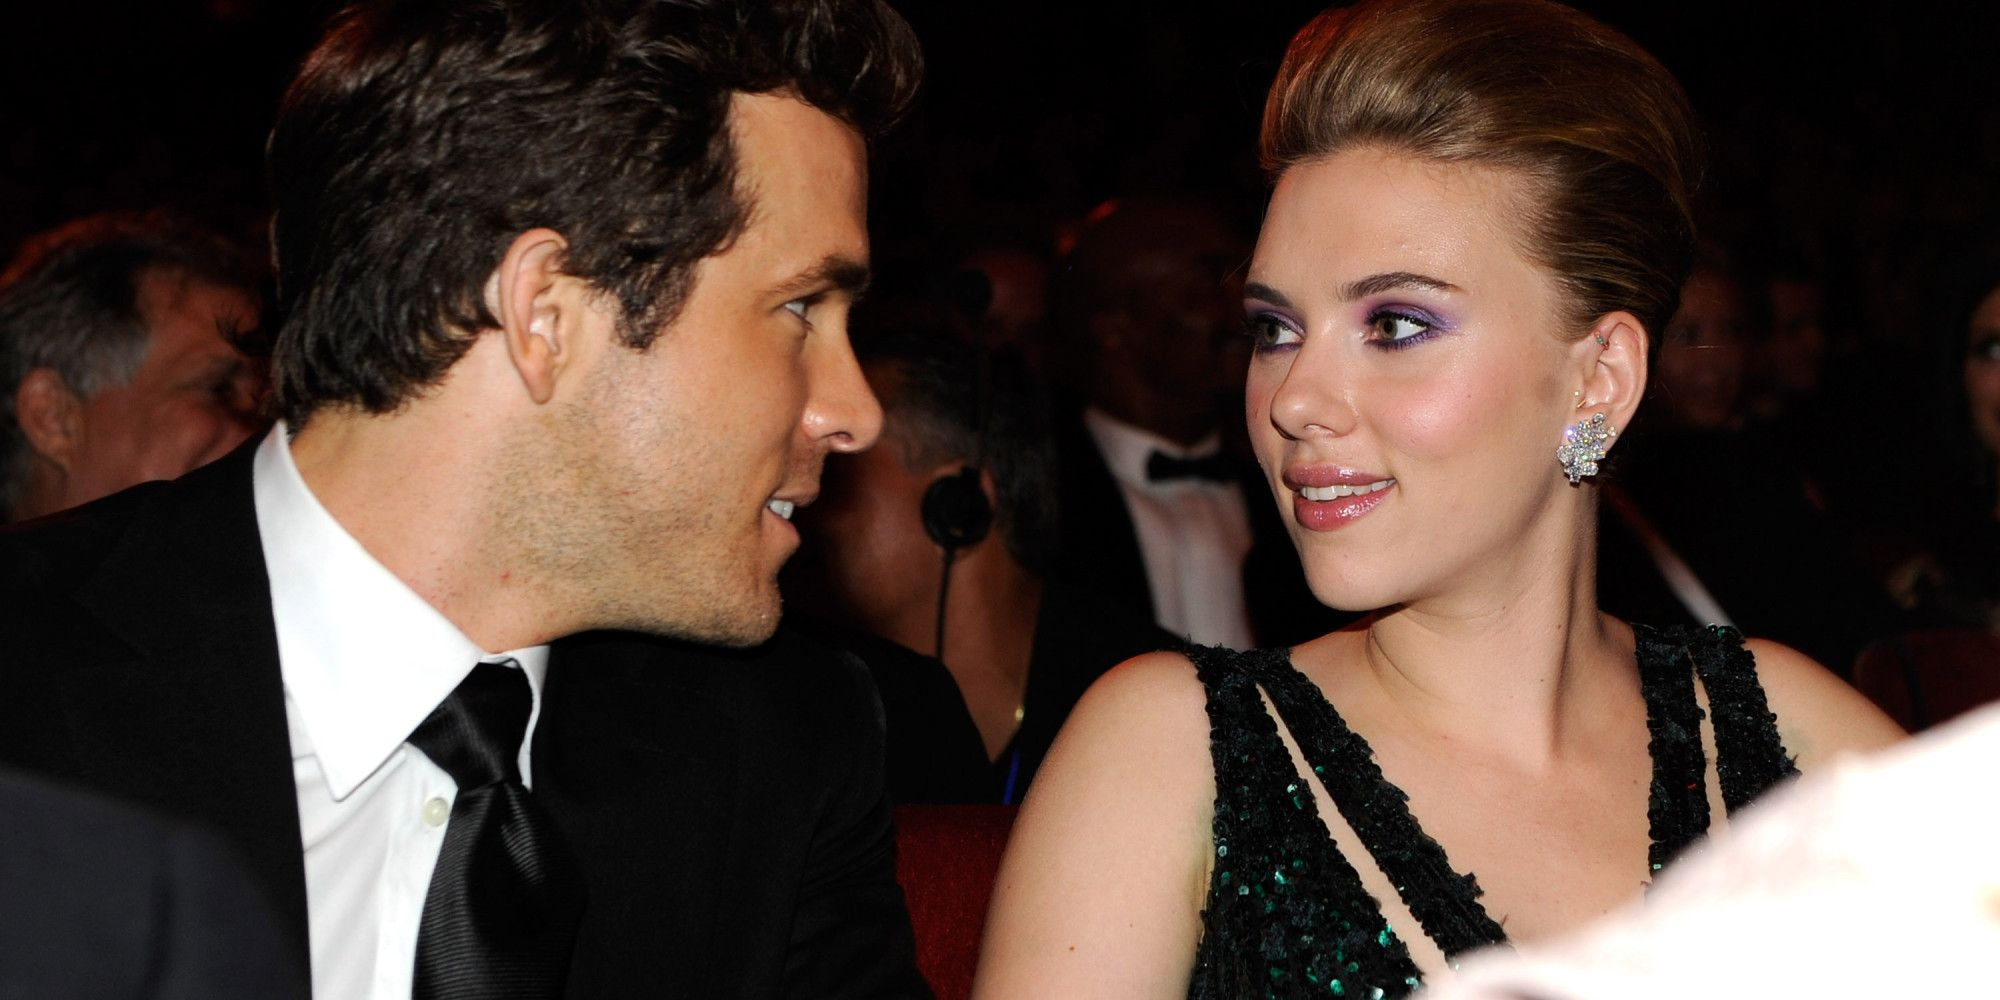 2007 2010. Ryan Reynolds and Scarlett Johansson Ryan